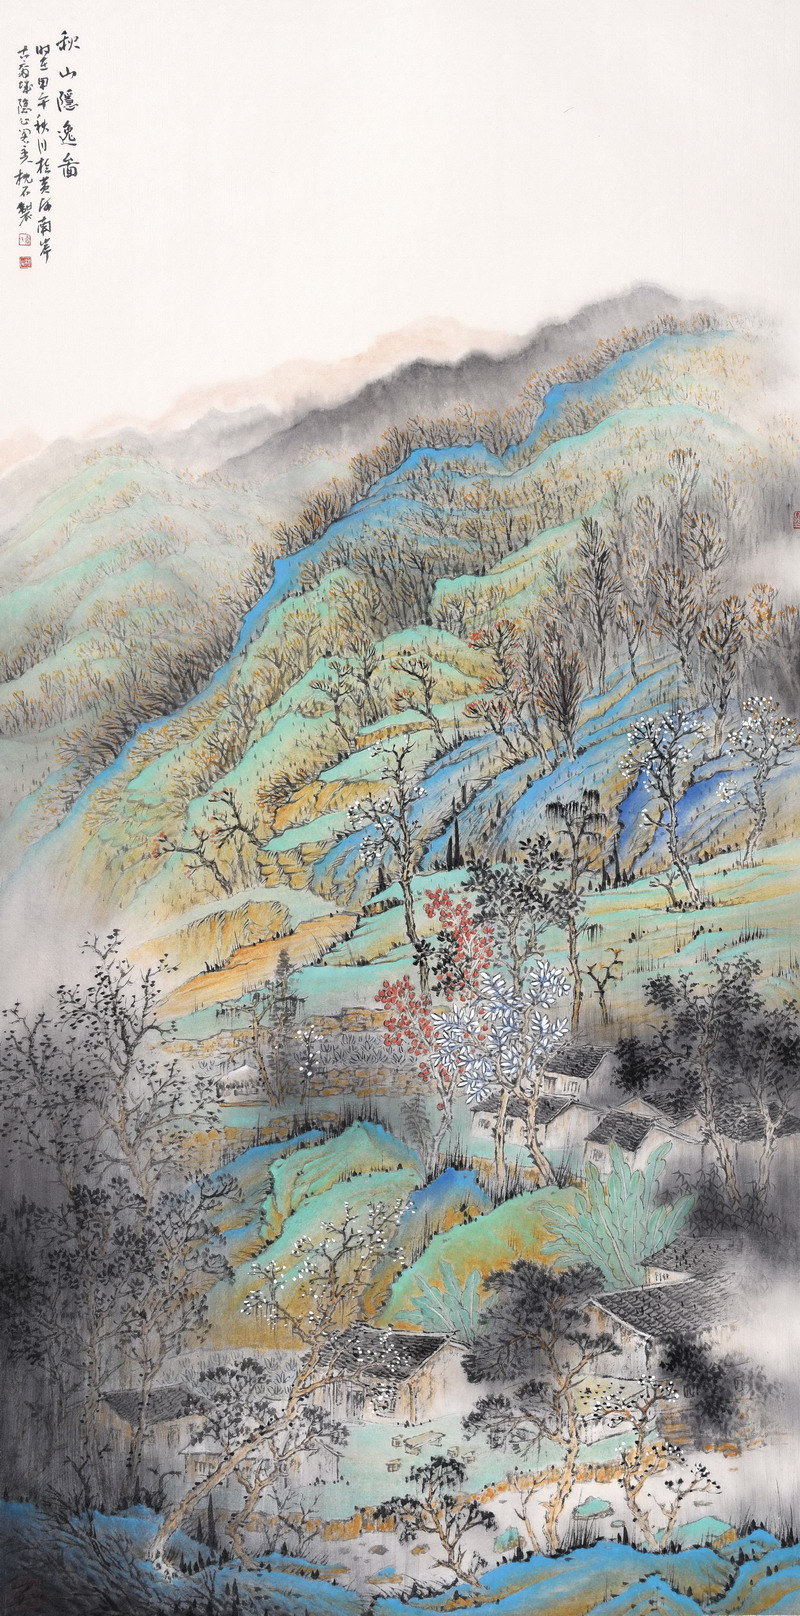 乔枕石山水画